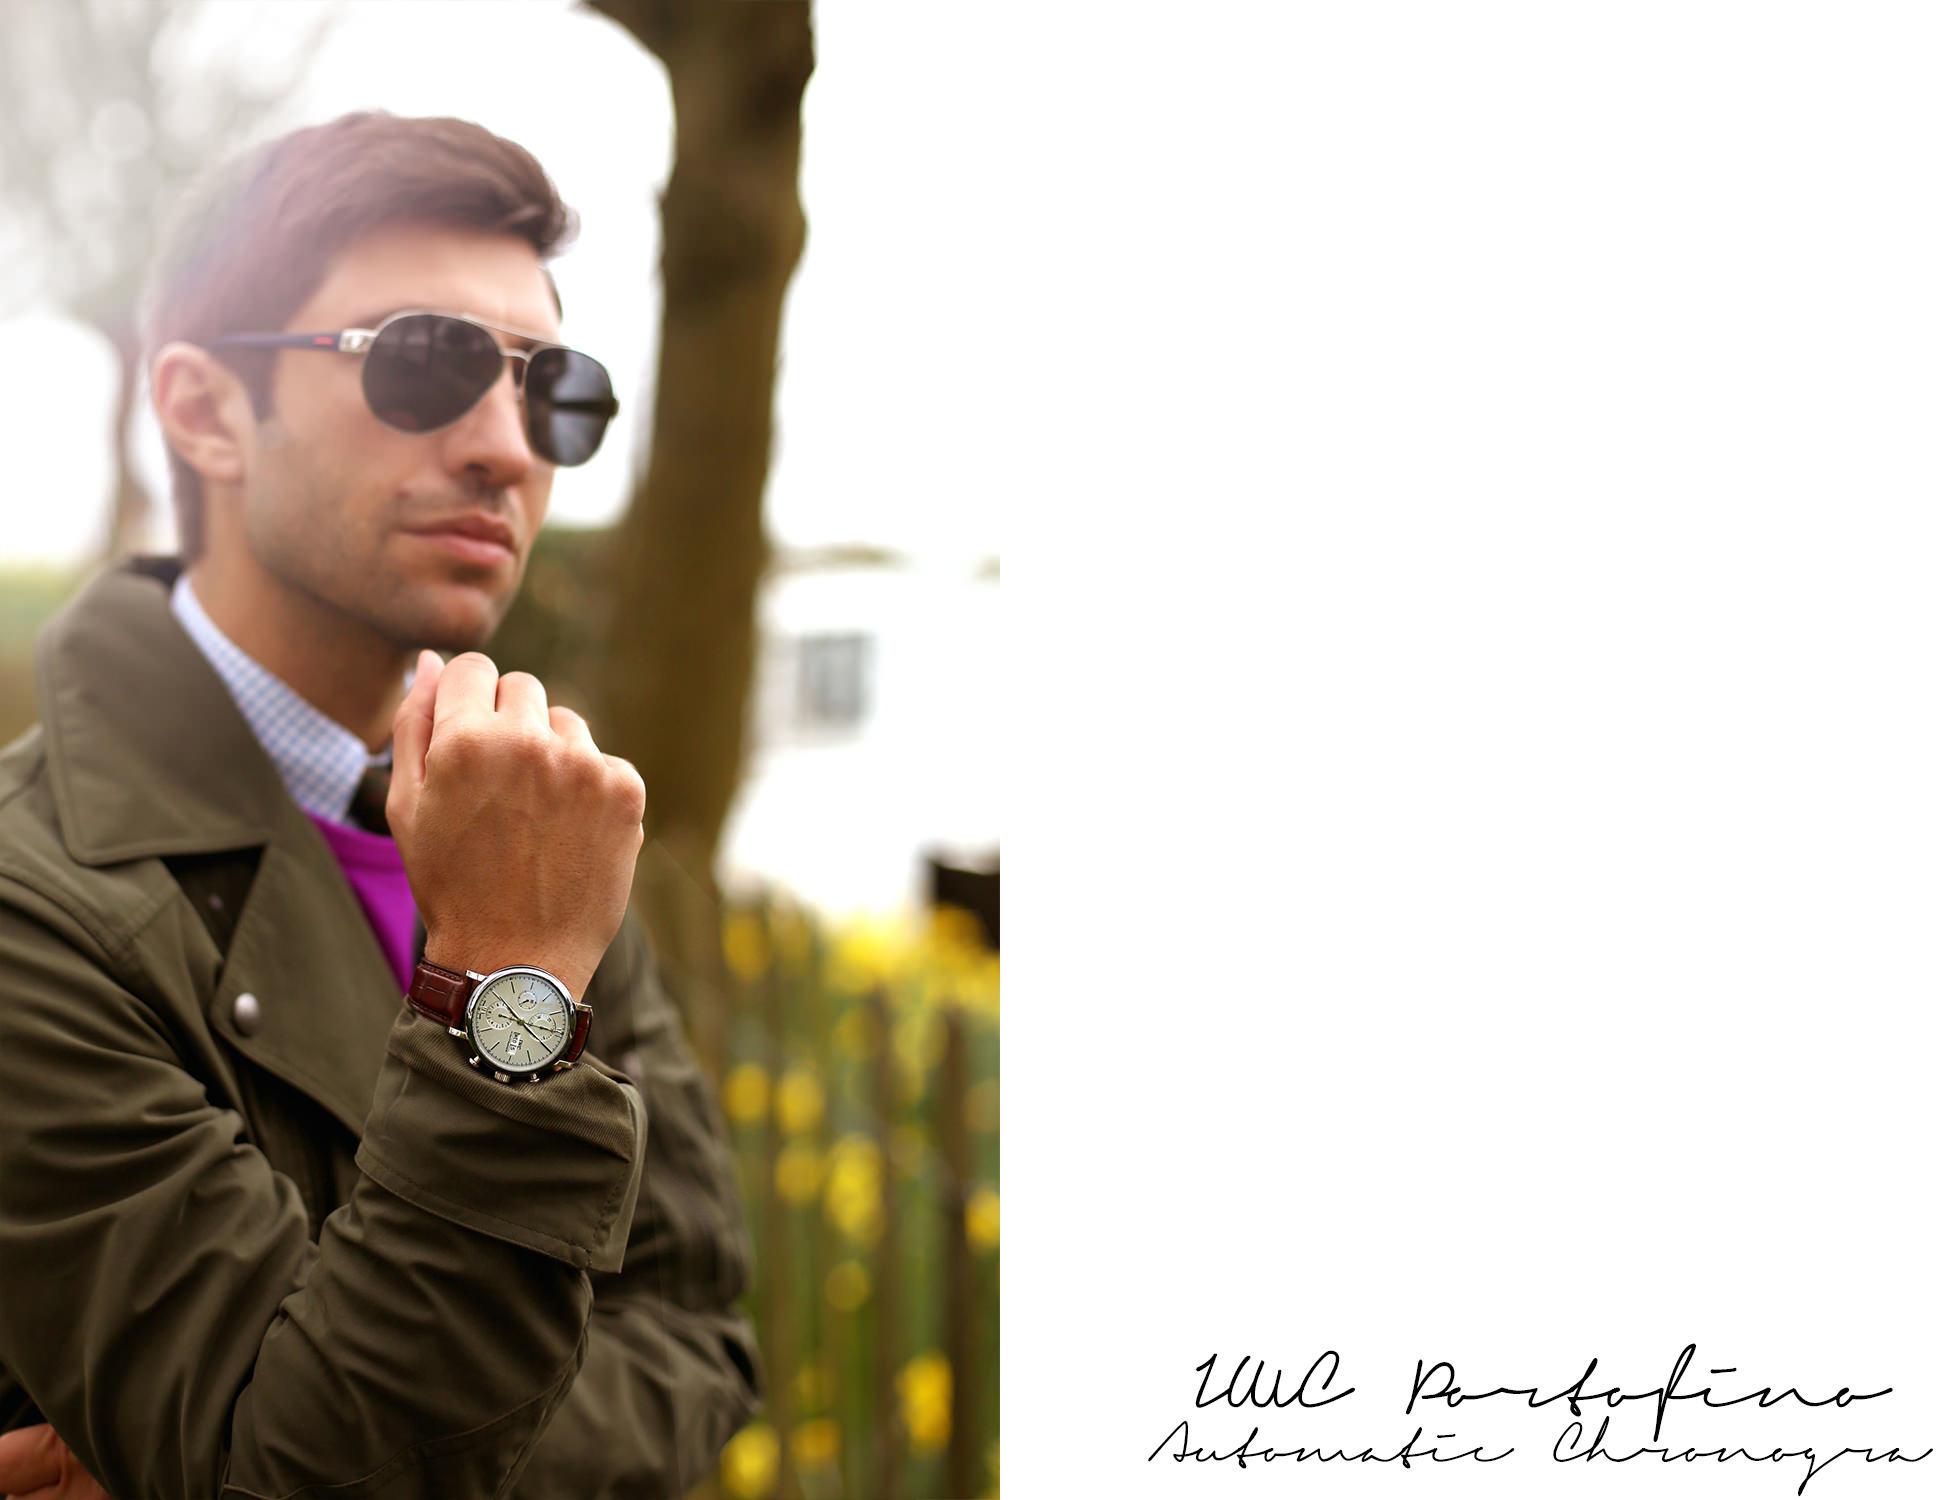 iwc portofino watch